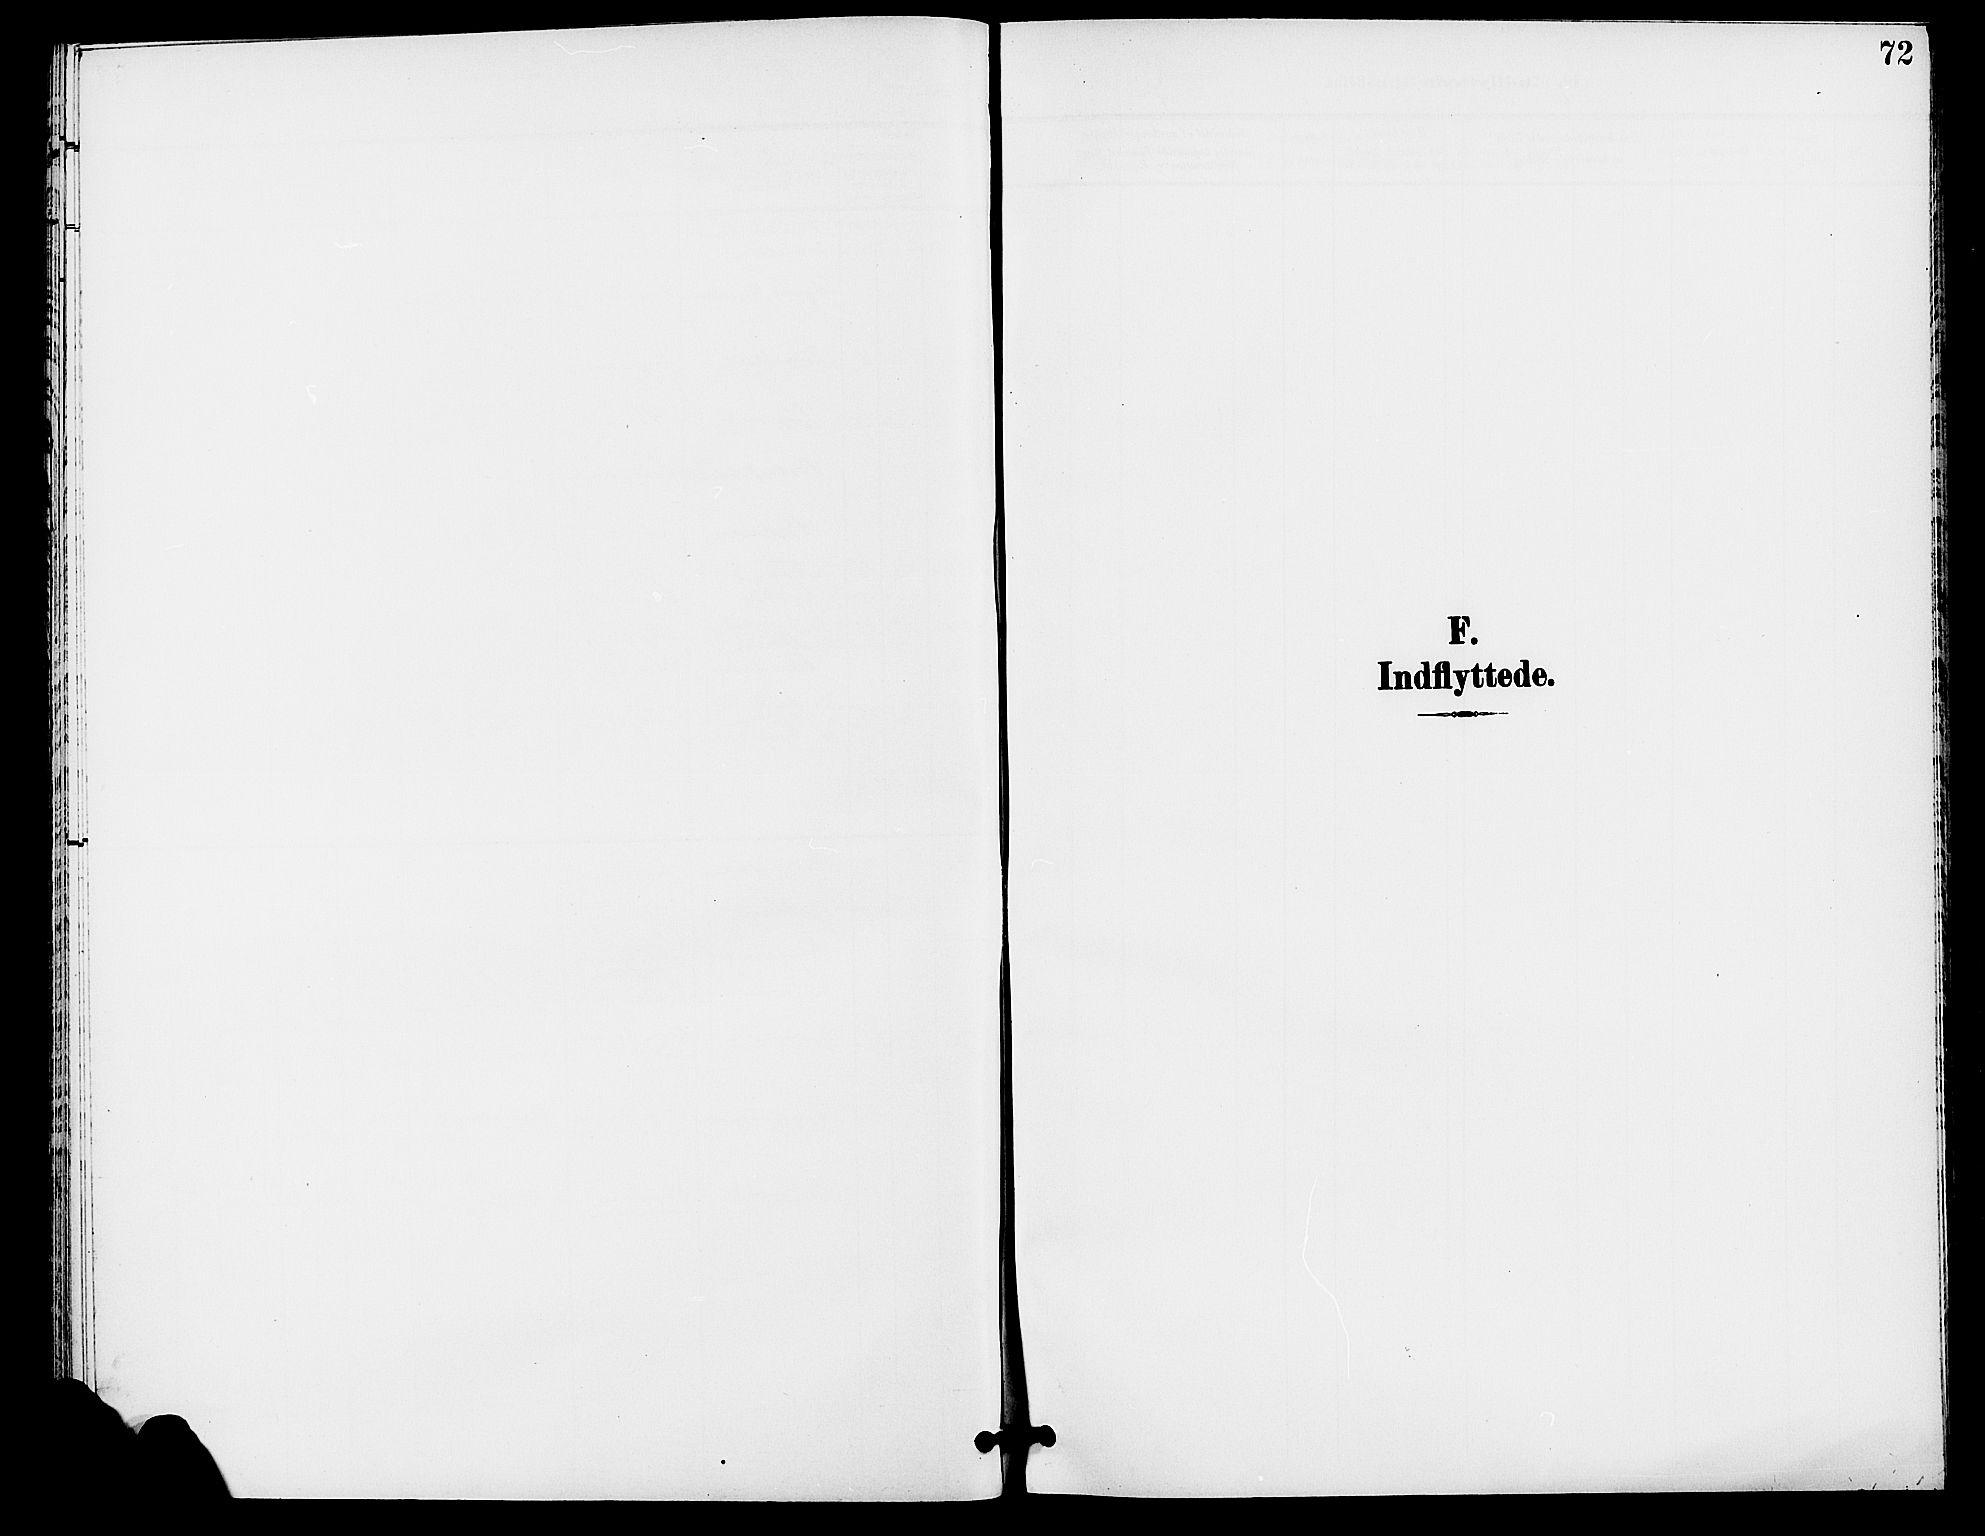 SAH, Rendalen prestekontor, H/Ha/Haa/L0008: Parish register (official) no. 8, 1898-1910, p. 72